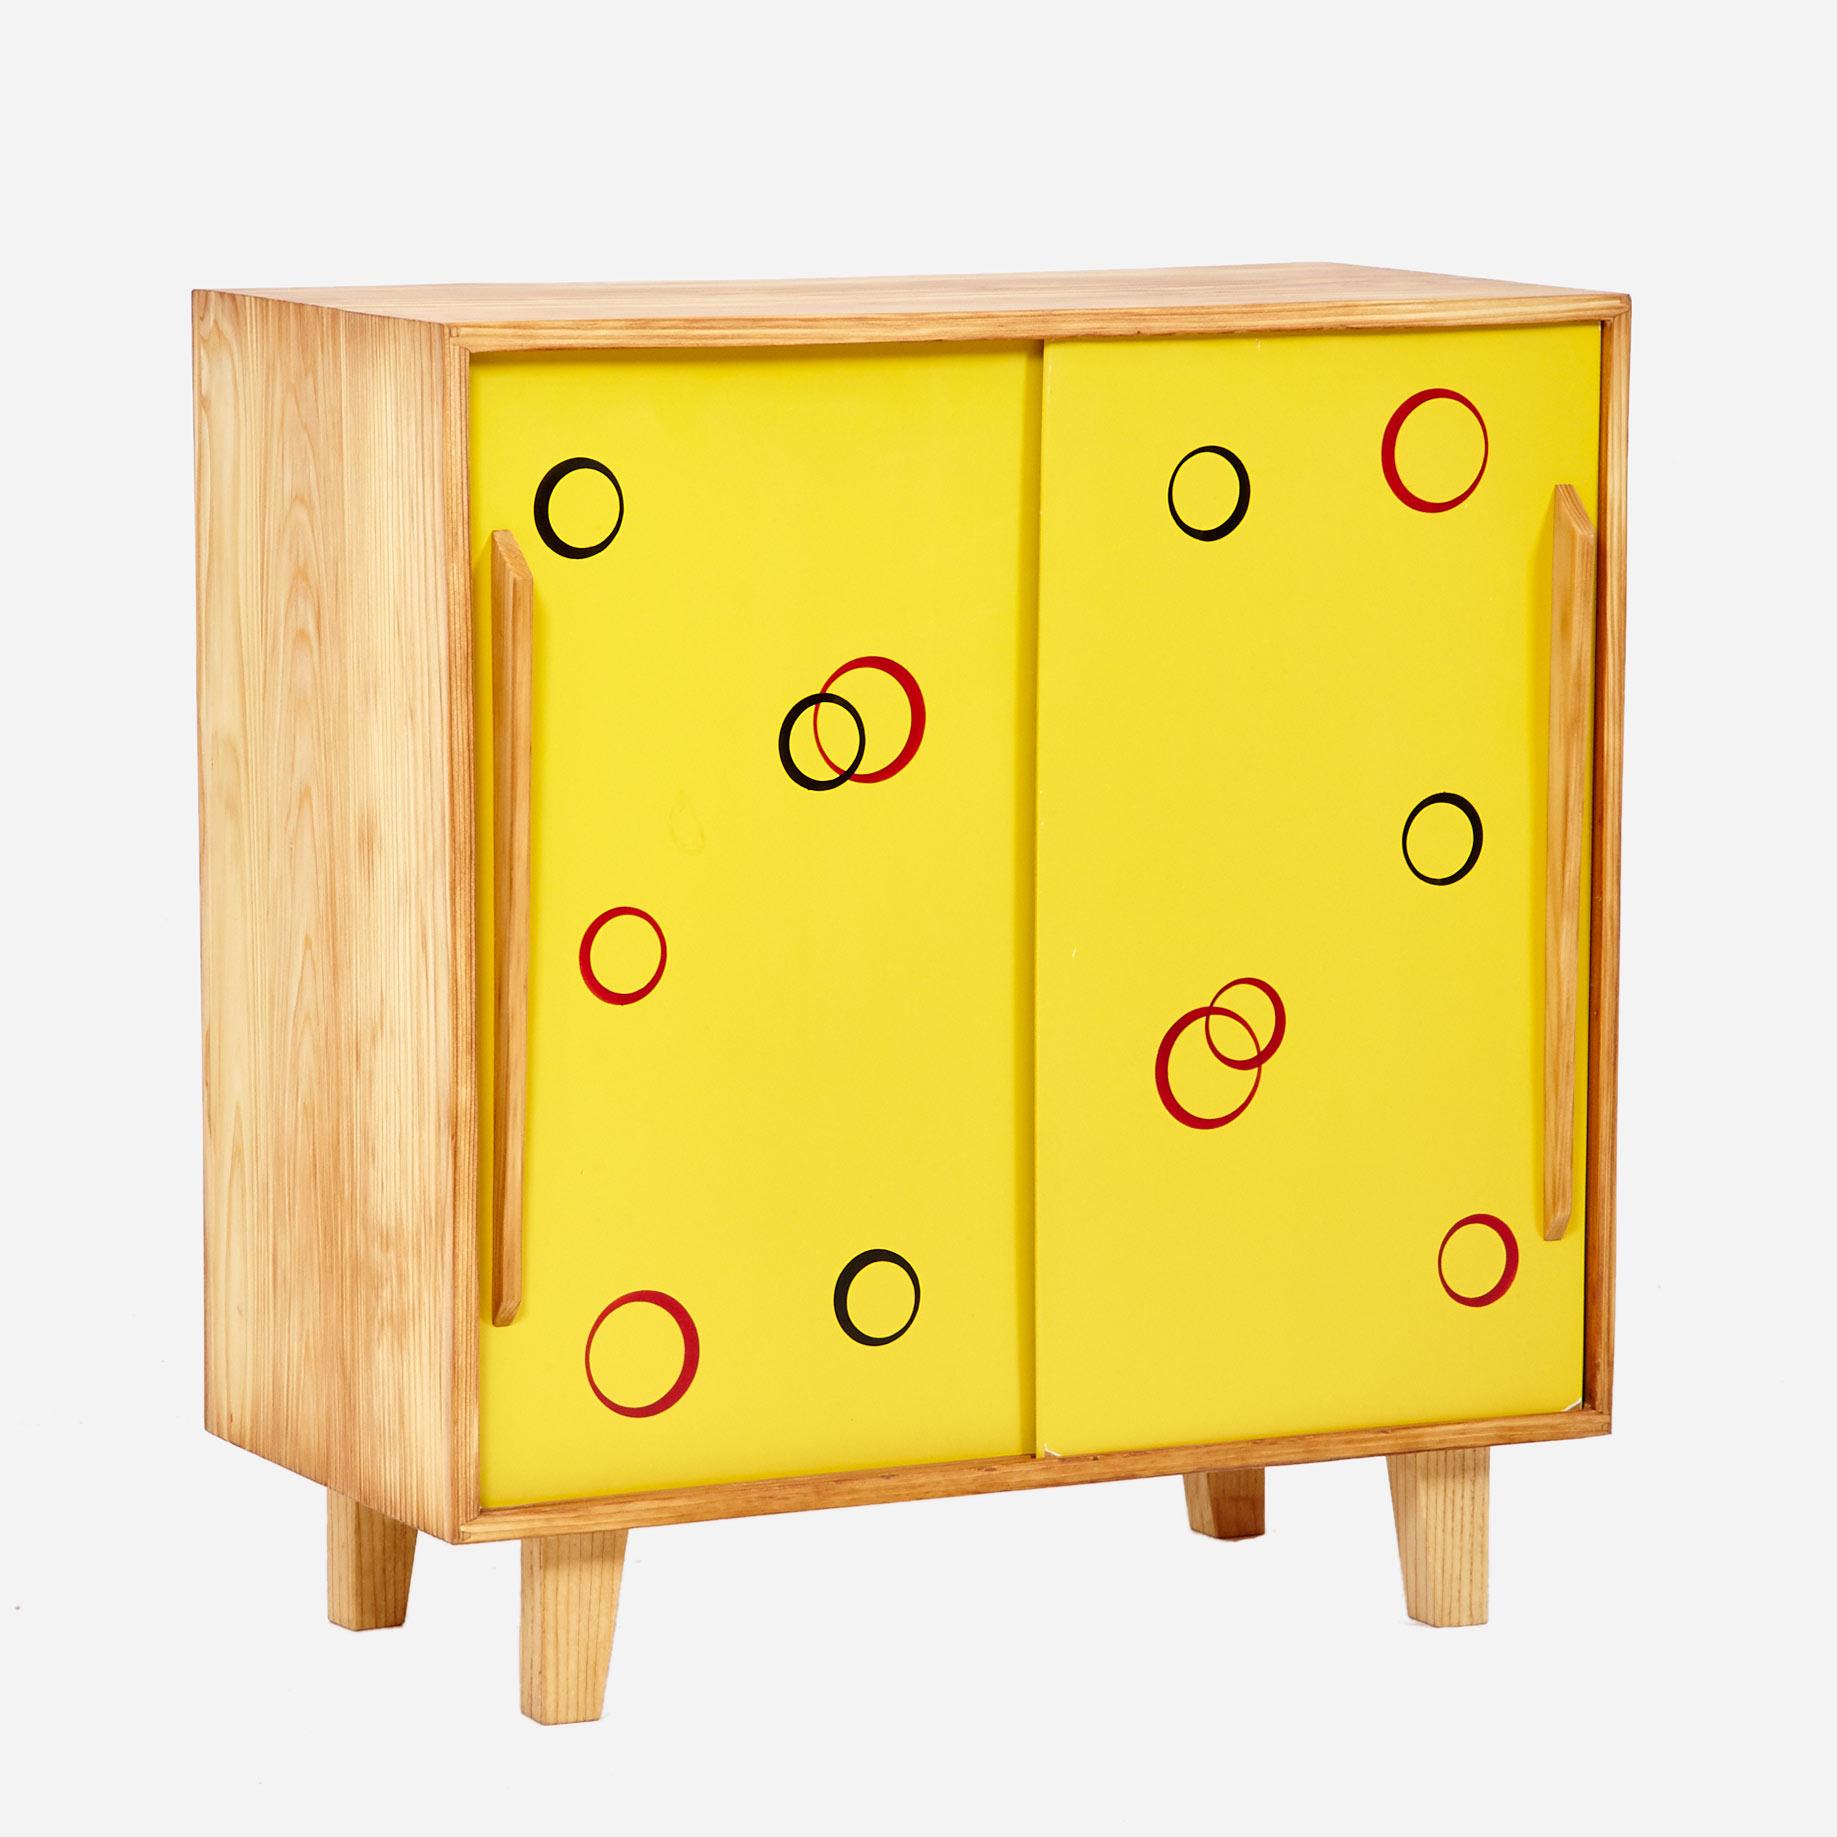 schiebeschrank restauriert m bel z rich vintagem bel. Black Bedroom Furniture Sets. Home Design Ideas